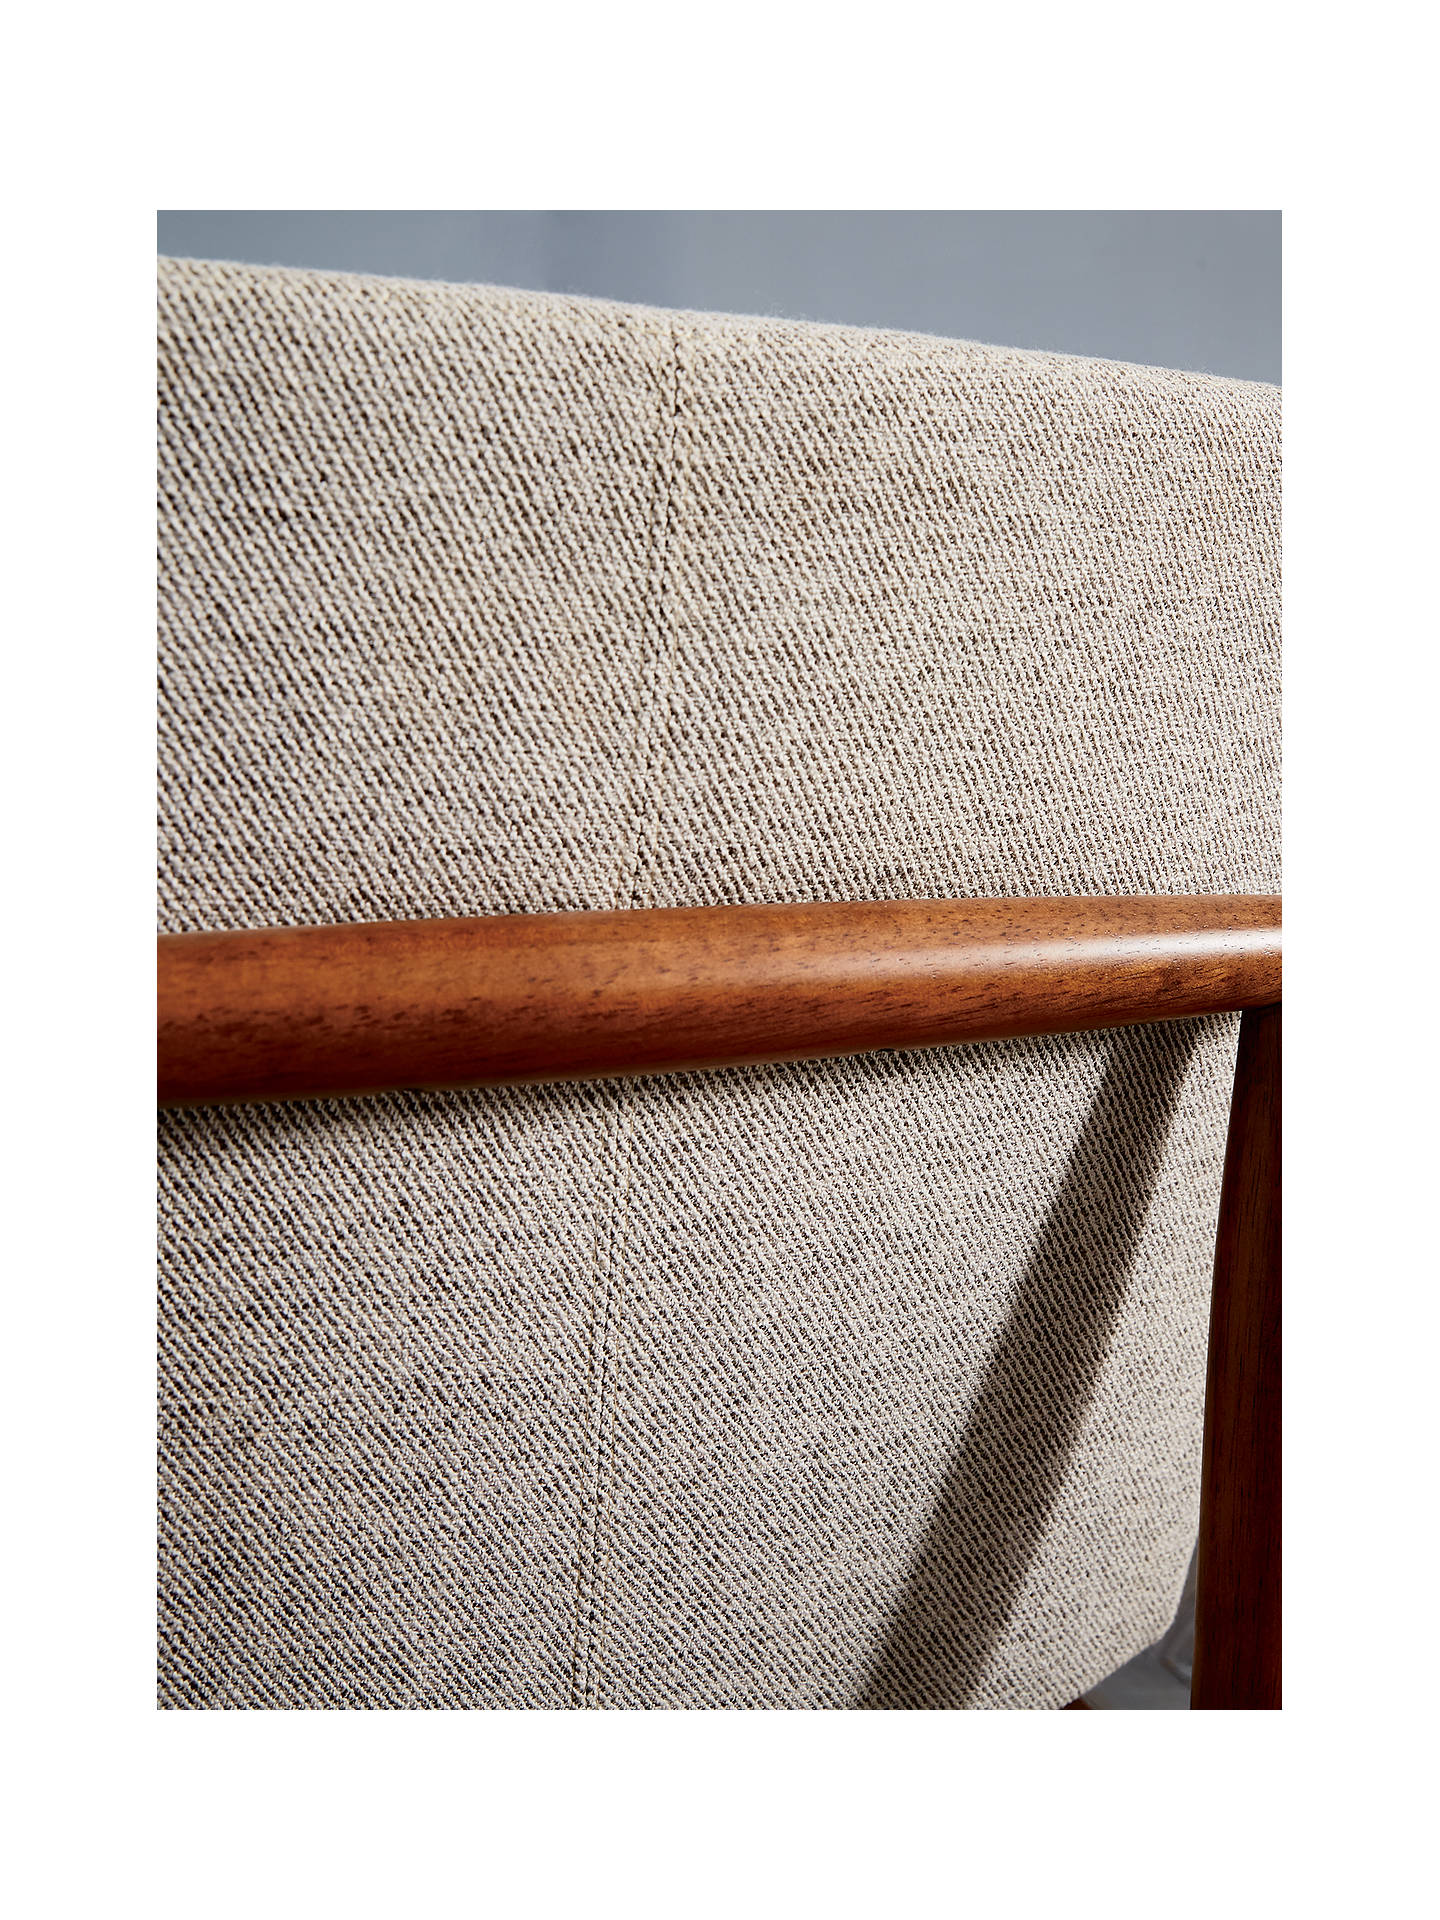 Peachy West Elm Framework Dining Chair Twill Walnut Short Links Chair Design For Home Short Linksinfo